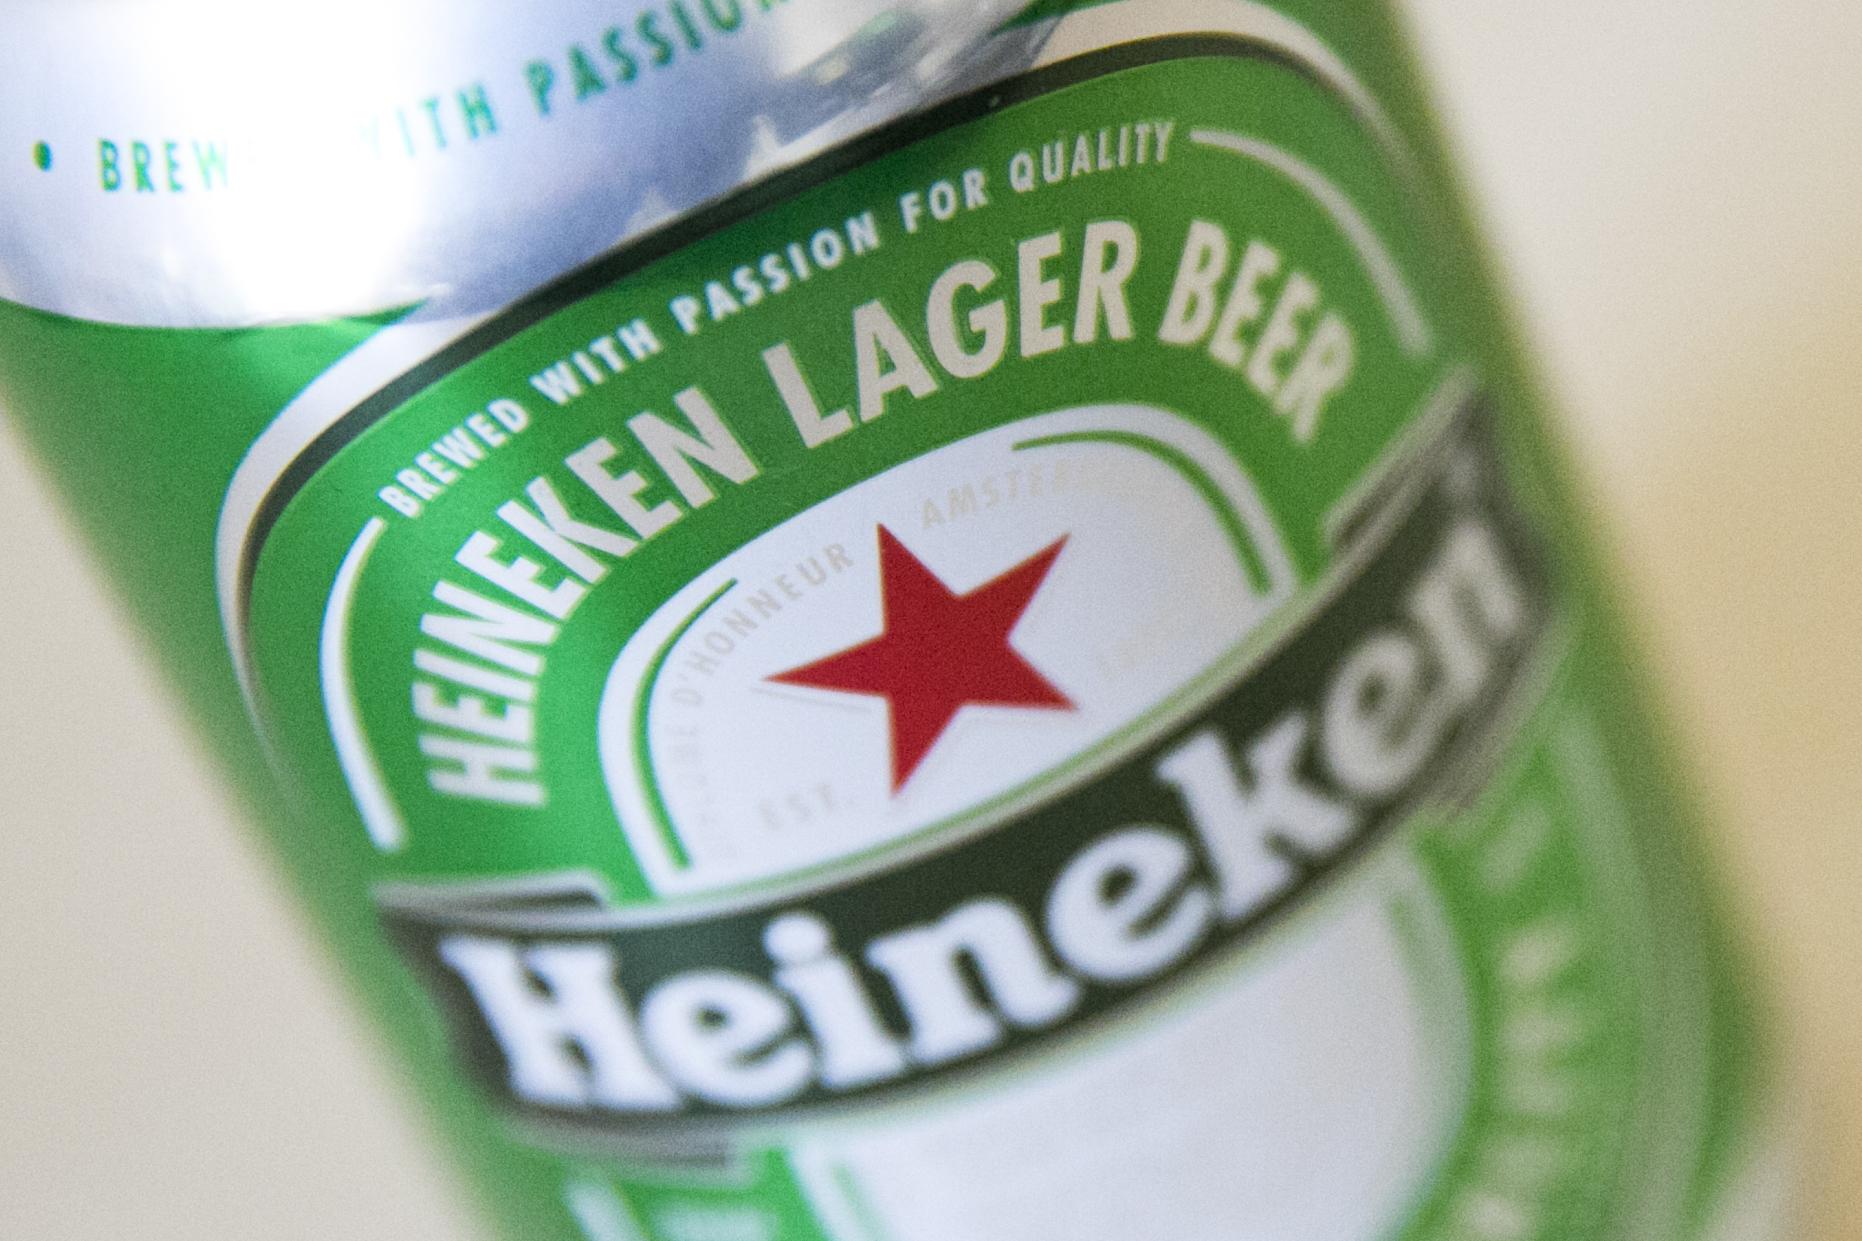 Világszerte 8000 embert rúg ki a Heineken